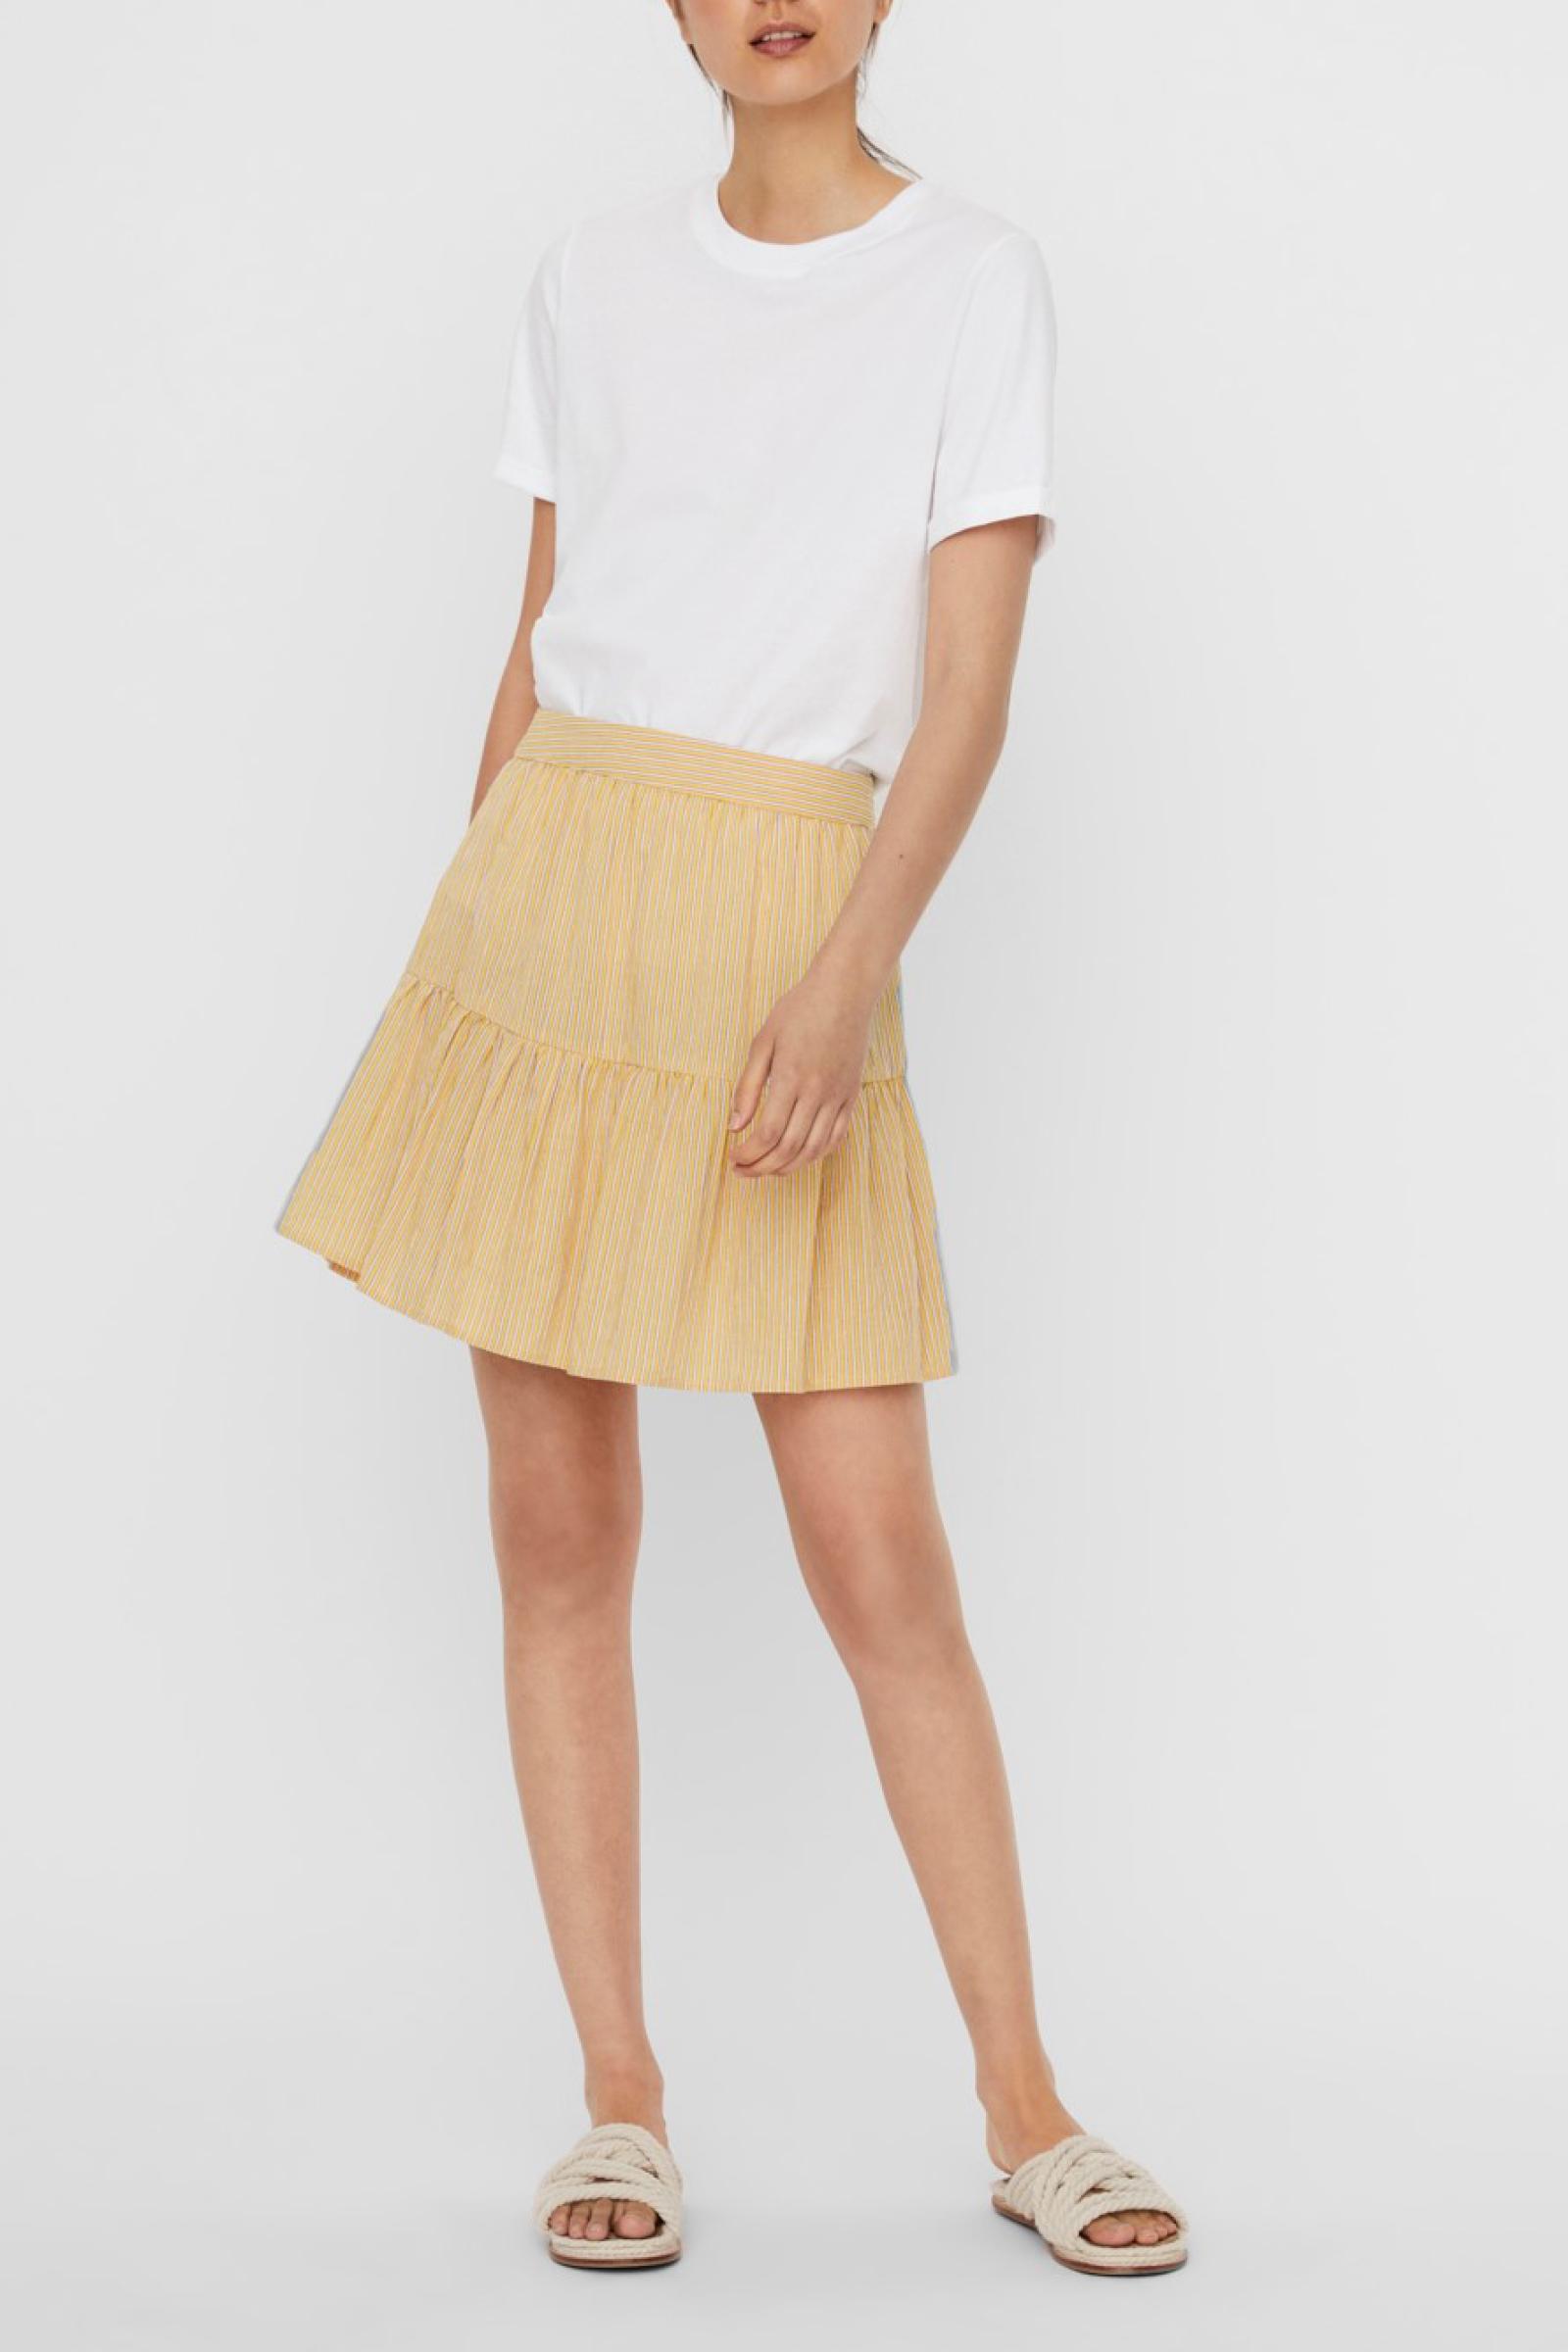 VERO MODA Skirt Woman VERO MODA | Skirt | 10243705Stripes-WITH ROSEATE SPOONBILL